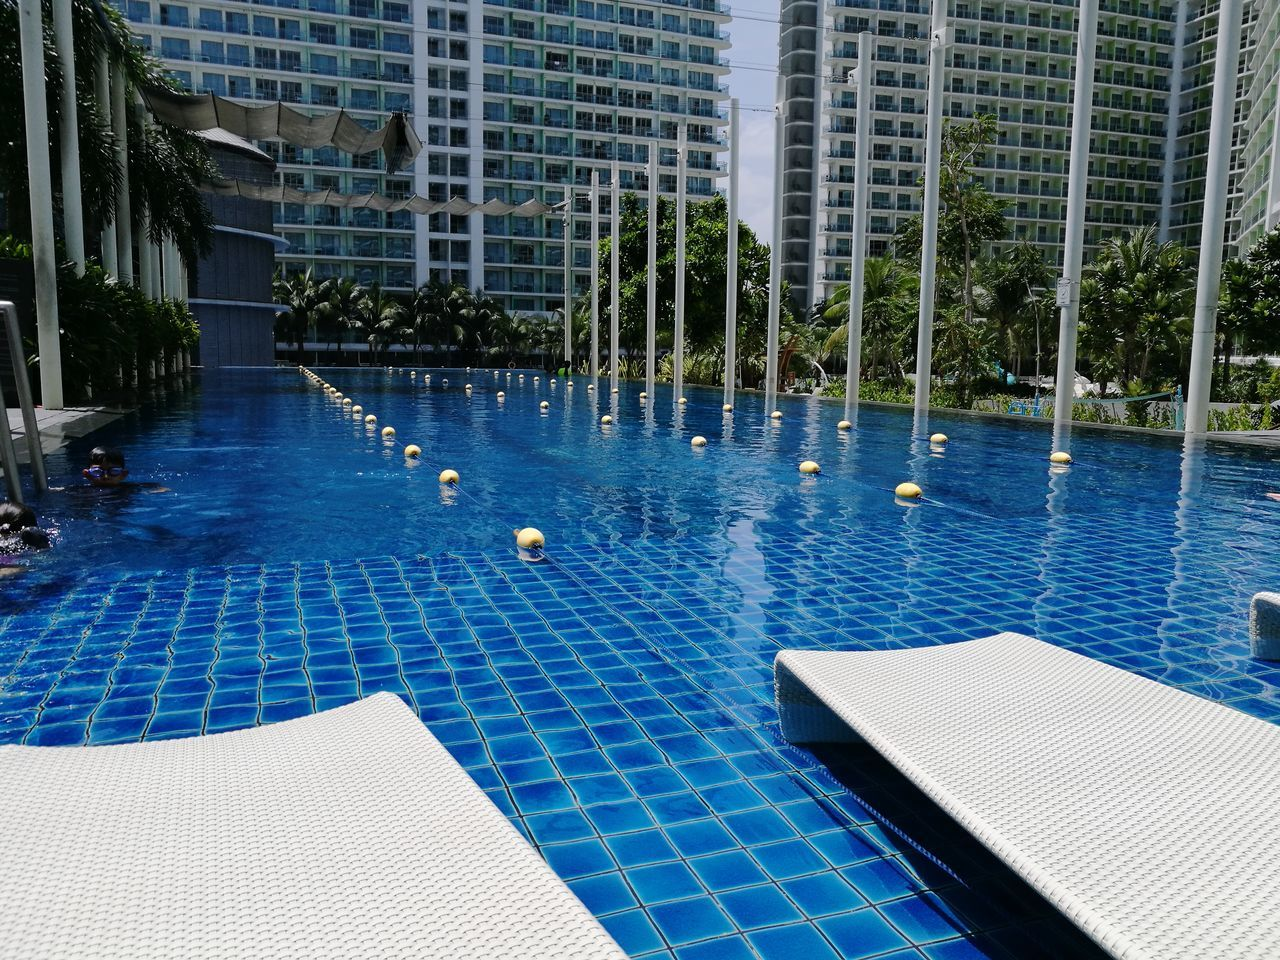 Lap Pool Staycation Azure Urban Beach Resort EyeemPhilippines